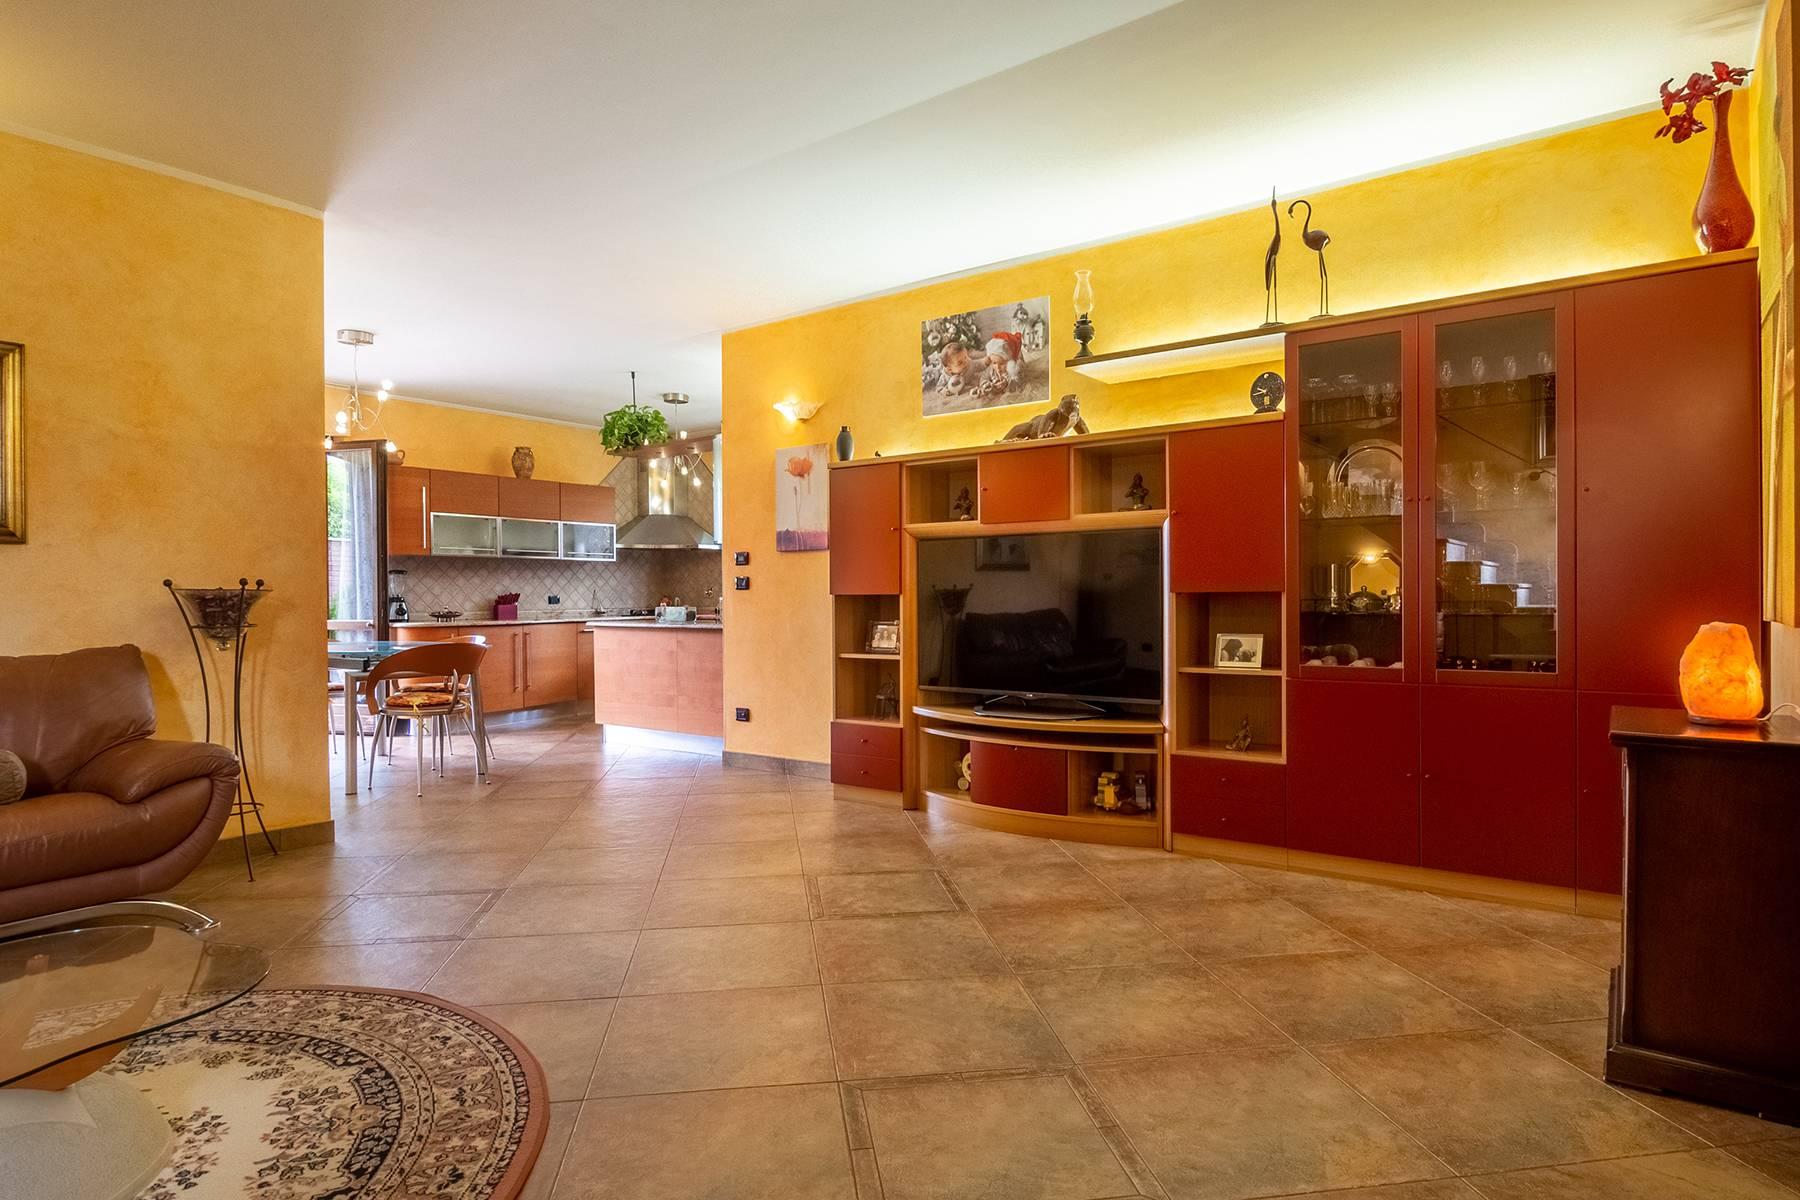 Villa in Vendita a Rosta: 5 locali, 182 mq - Foto 9